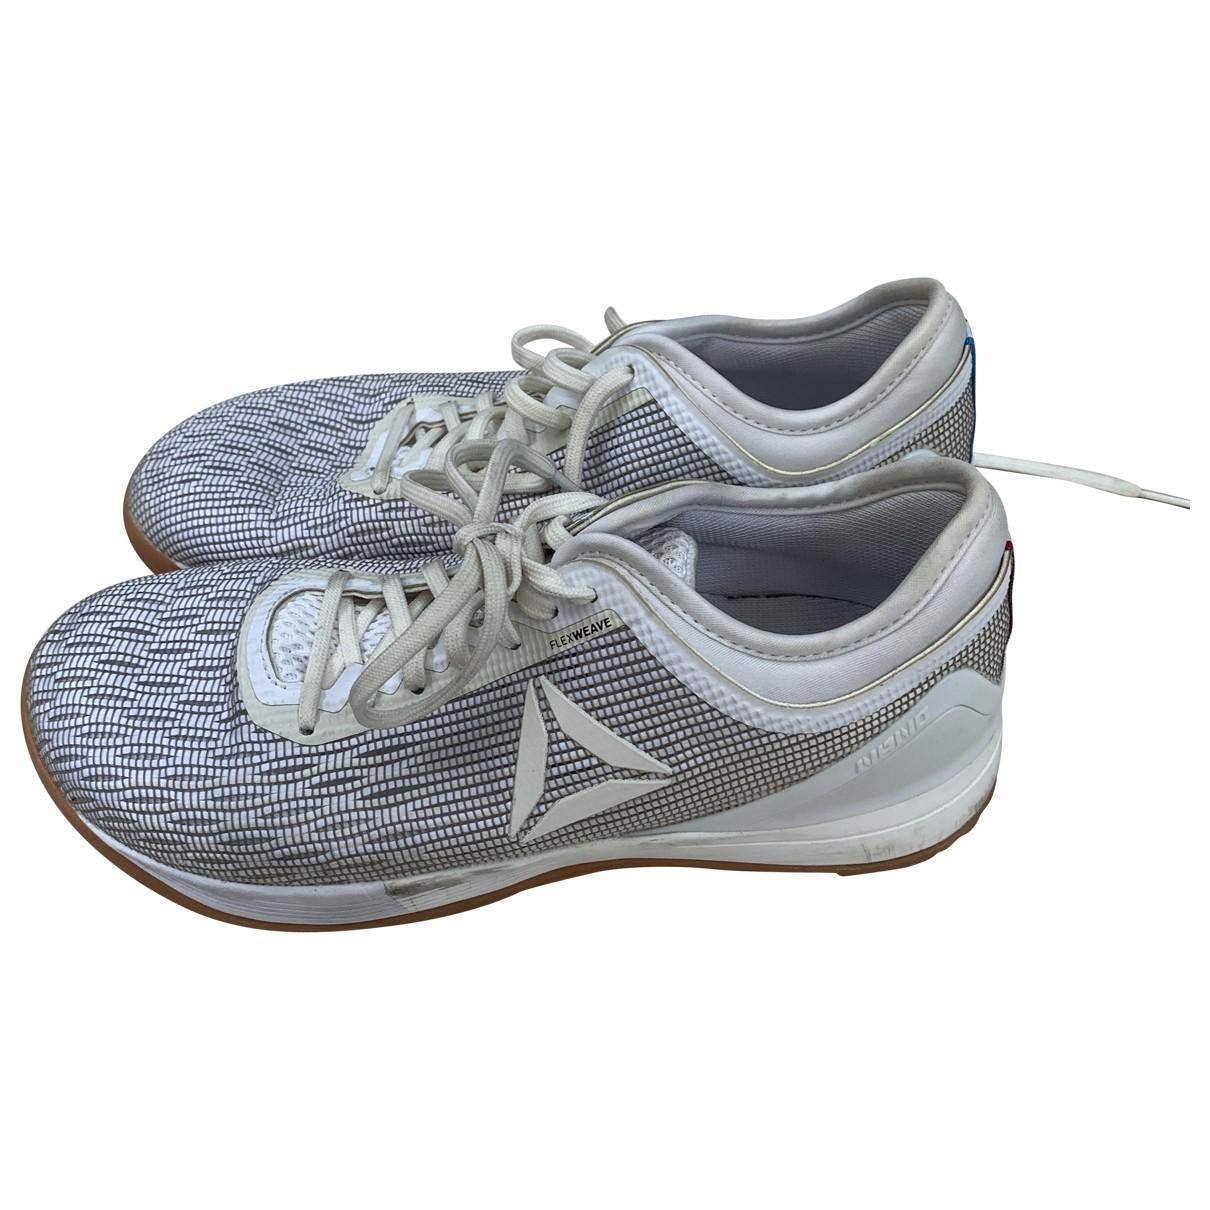 Reebok \N Sneakers in  Weiss Kautschuk